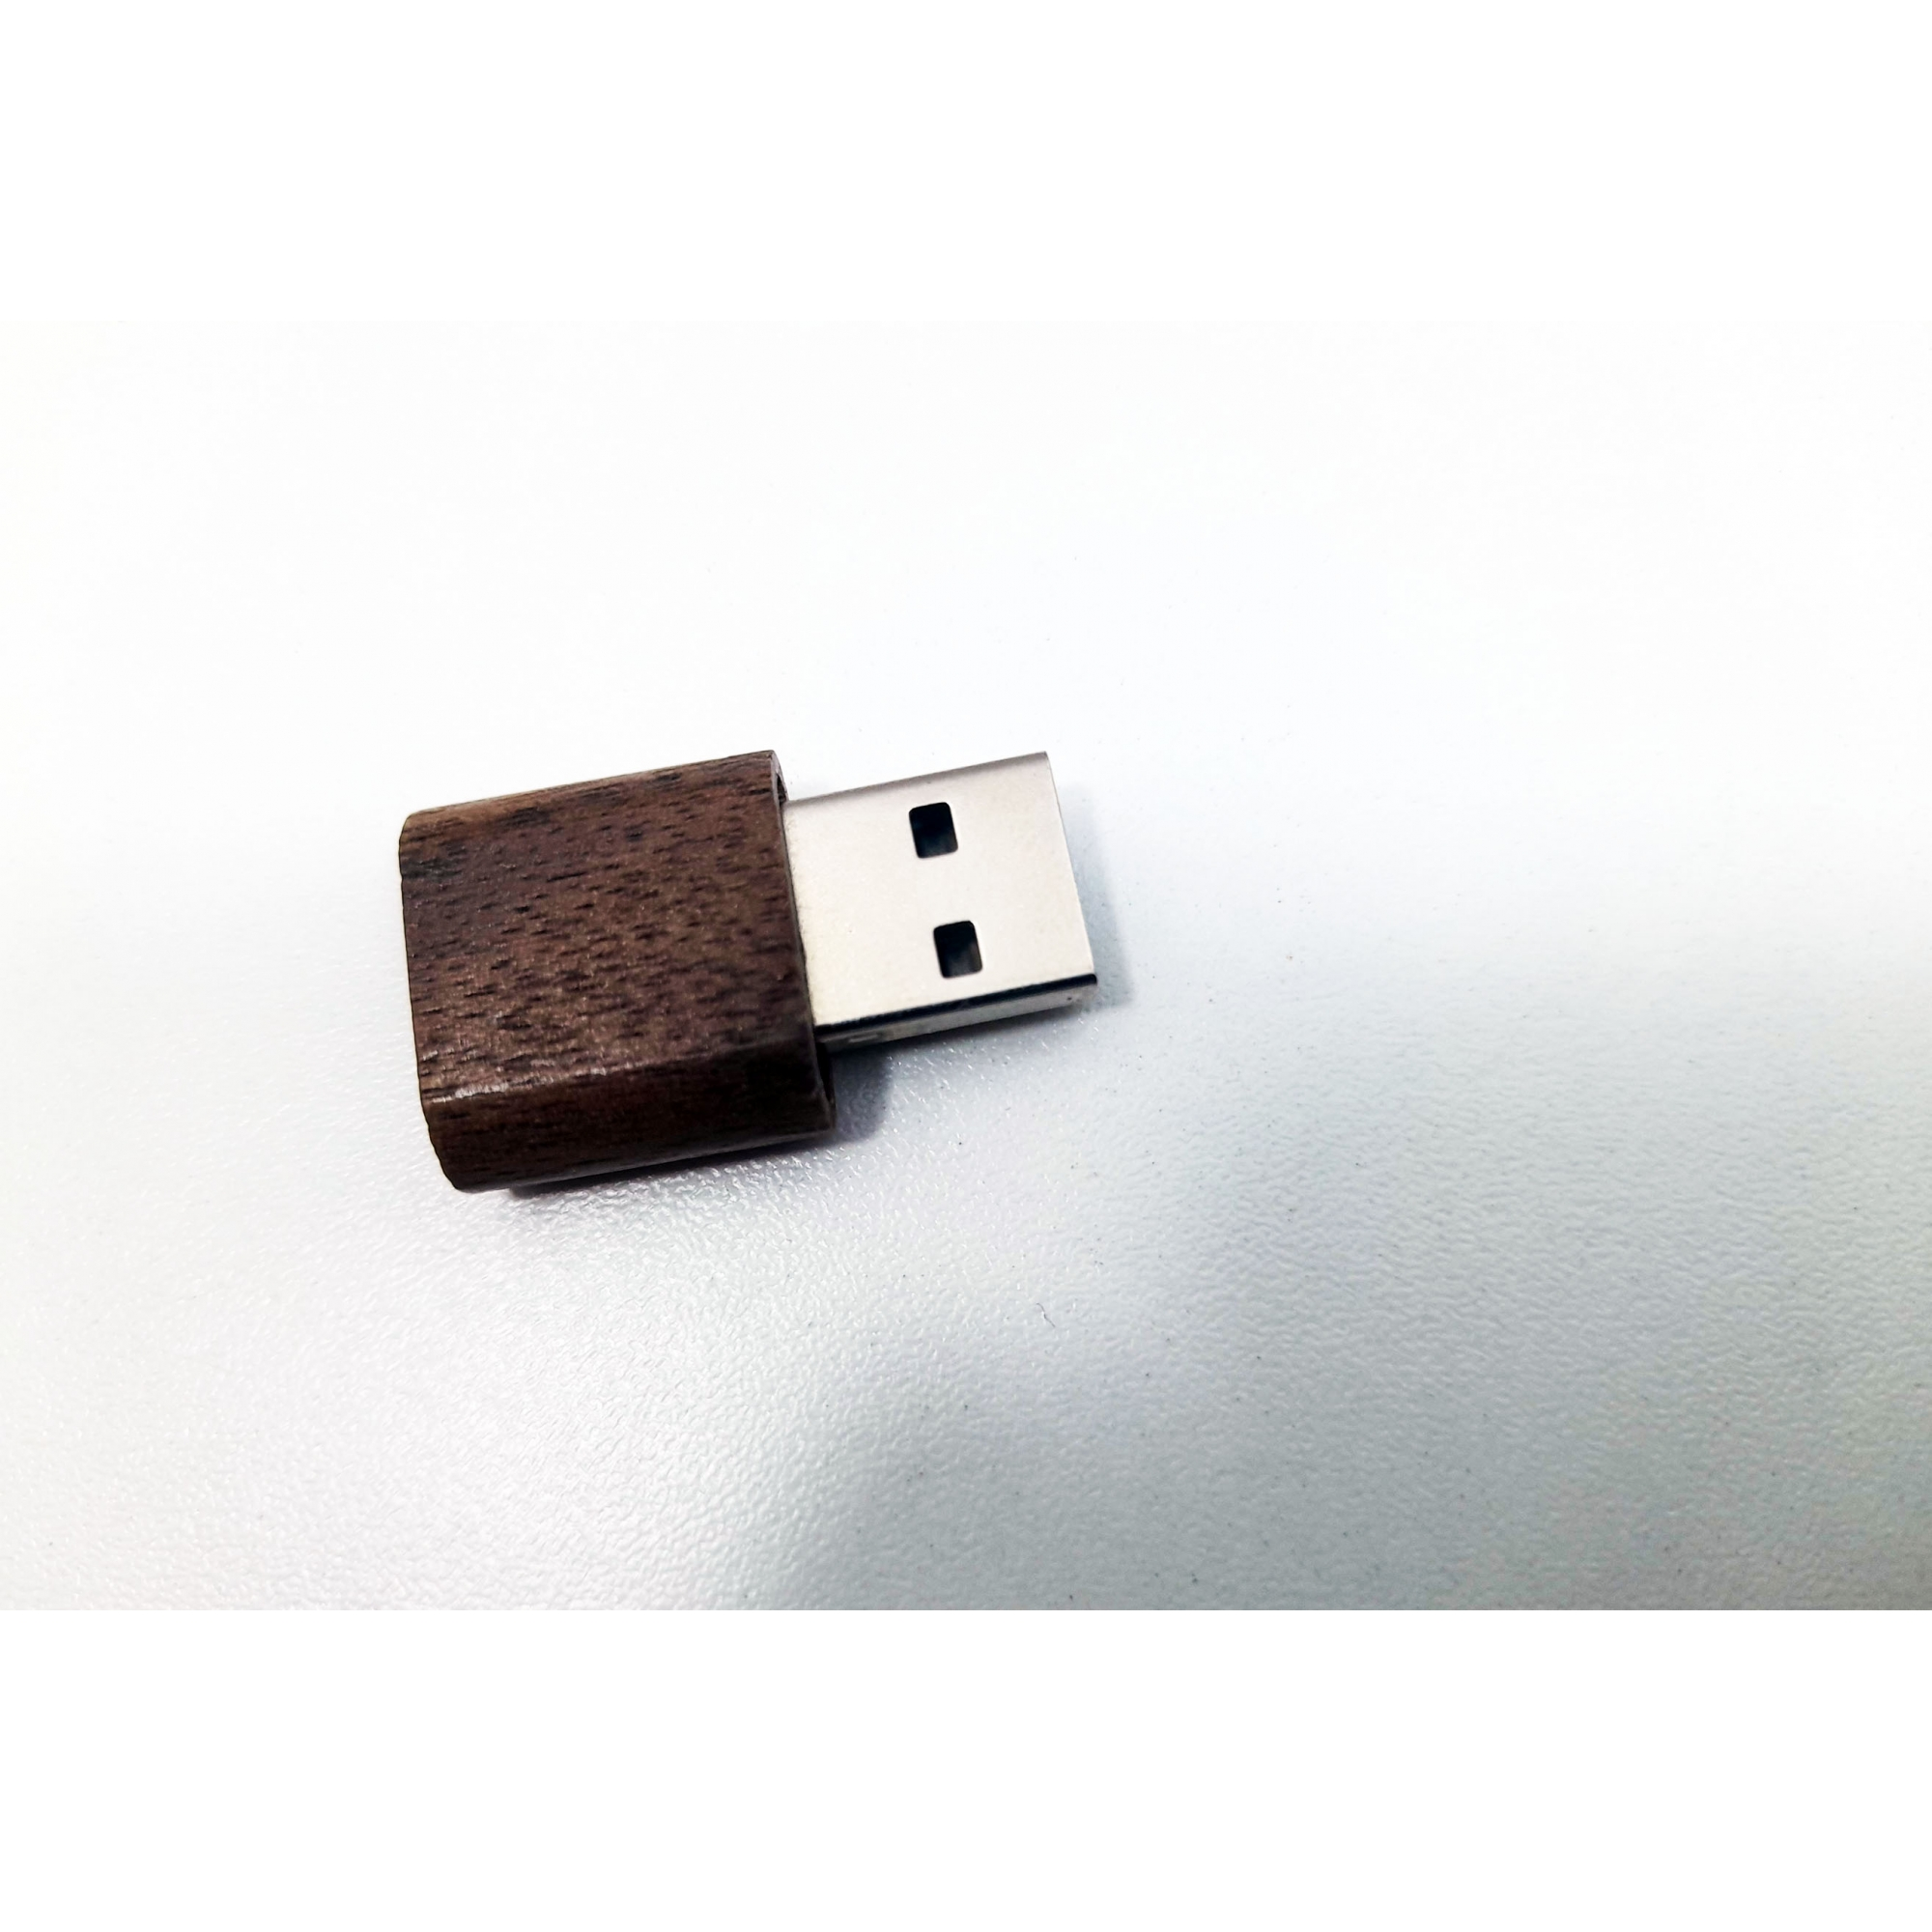 Pendrive Ecológico Fit Slim Dark de 8 GB - Linha rECOdrive